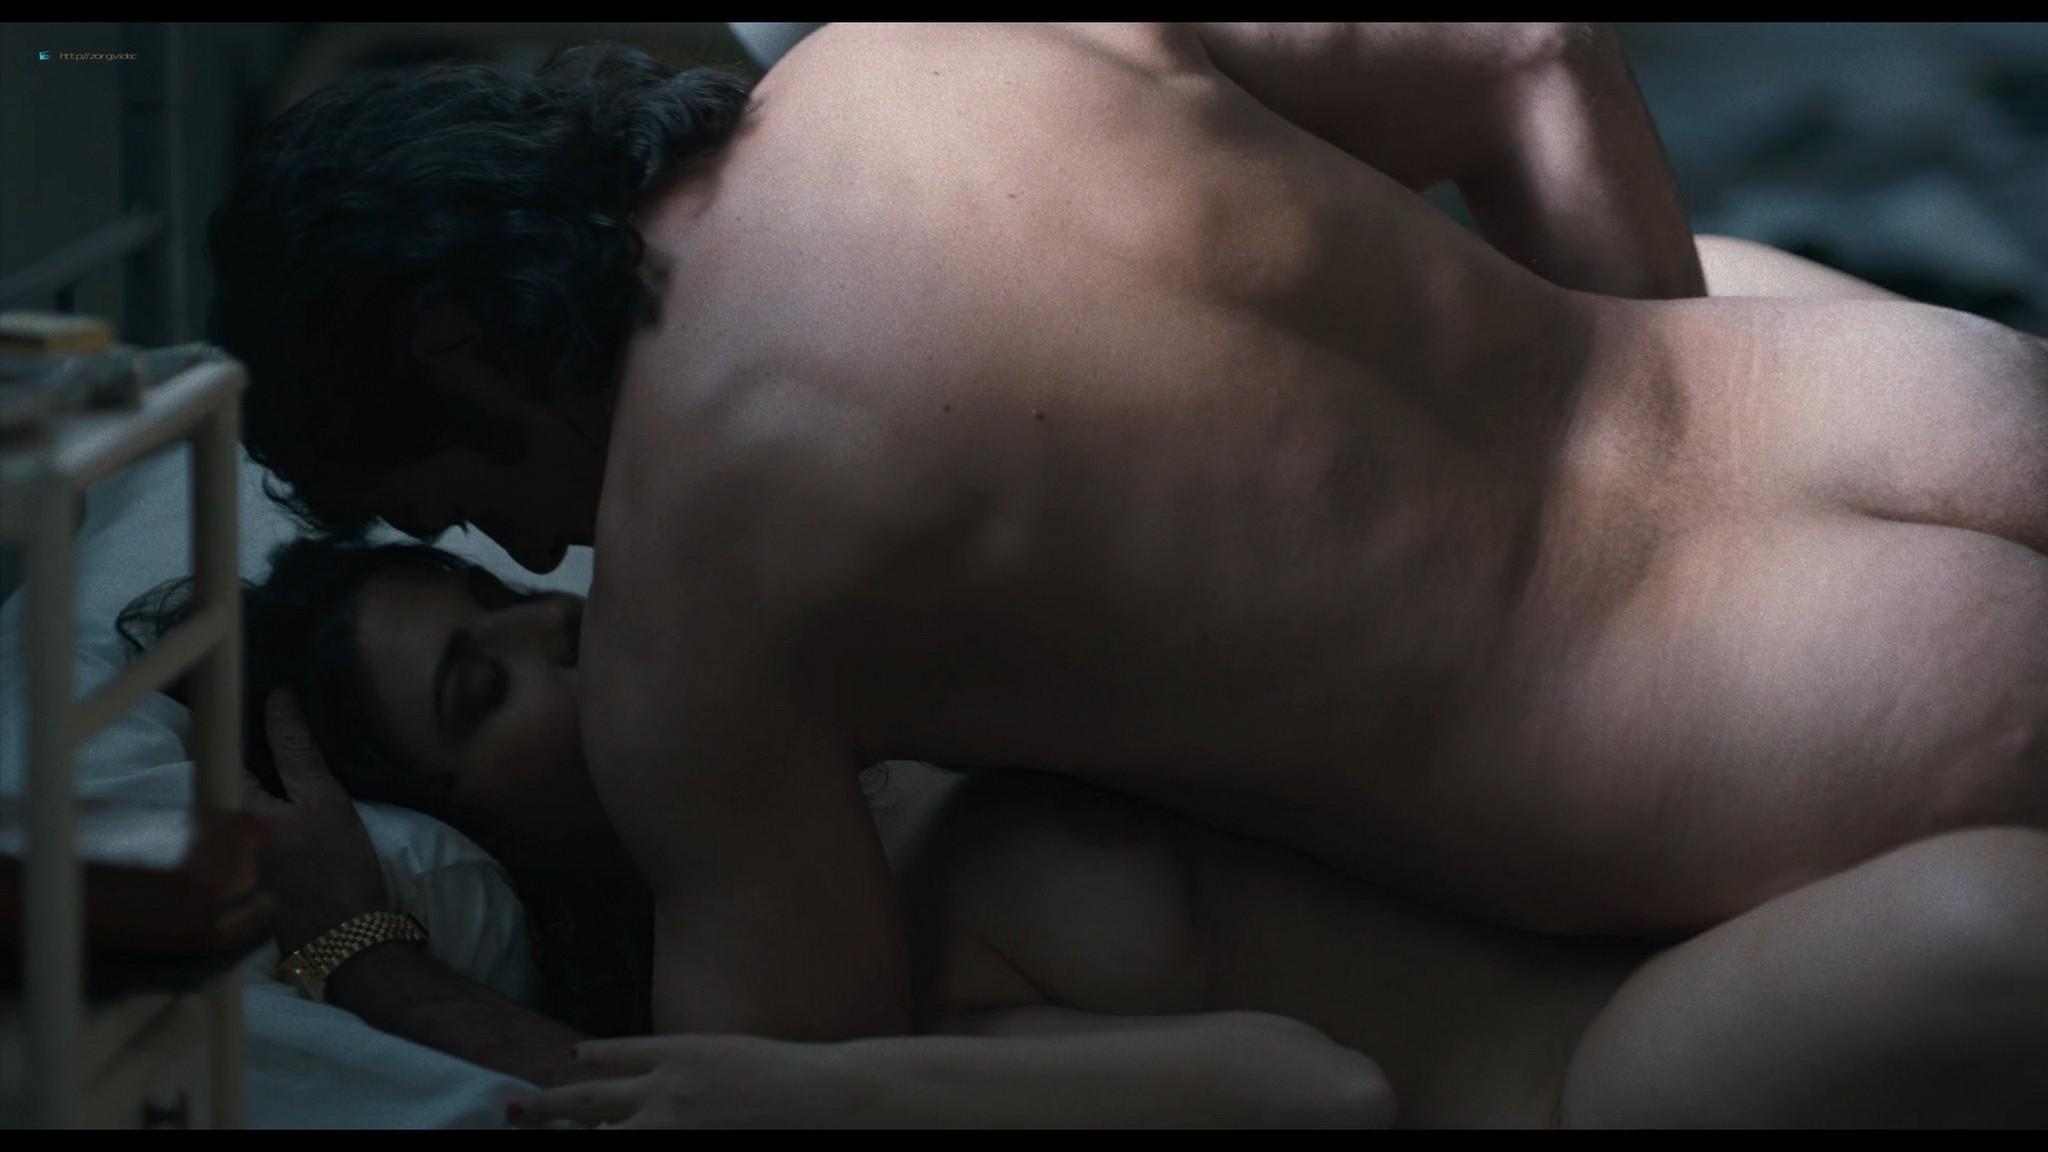 Maria Fernanda Cândido nude Marilina Marino nude sex - The Traitor (2019) HD 1080p BluRay (3)